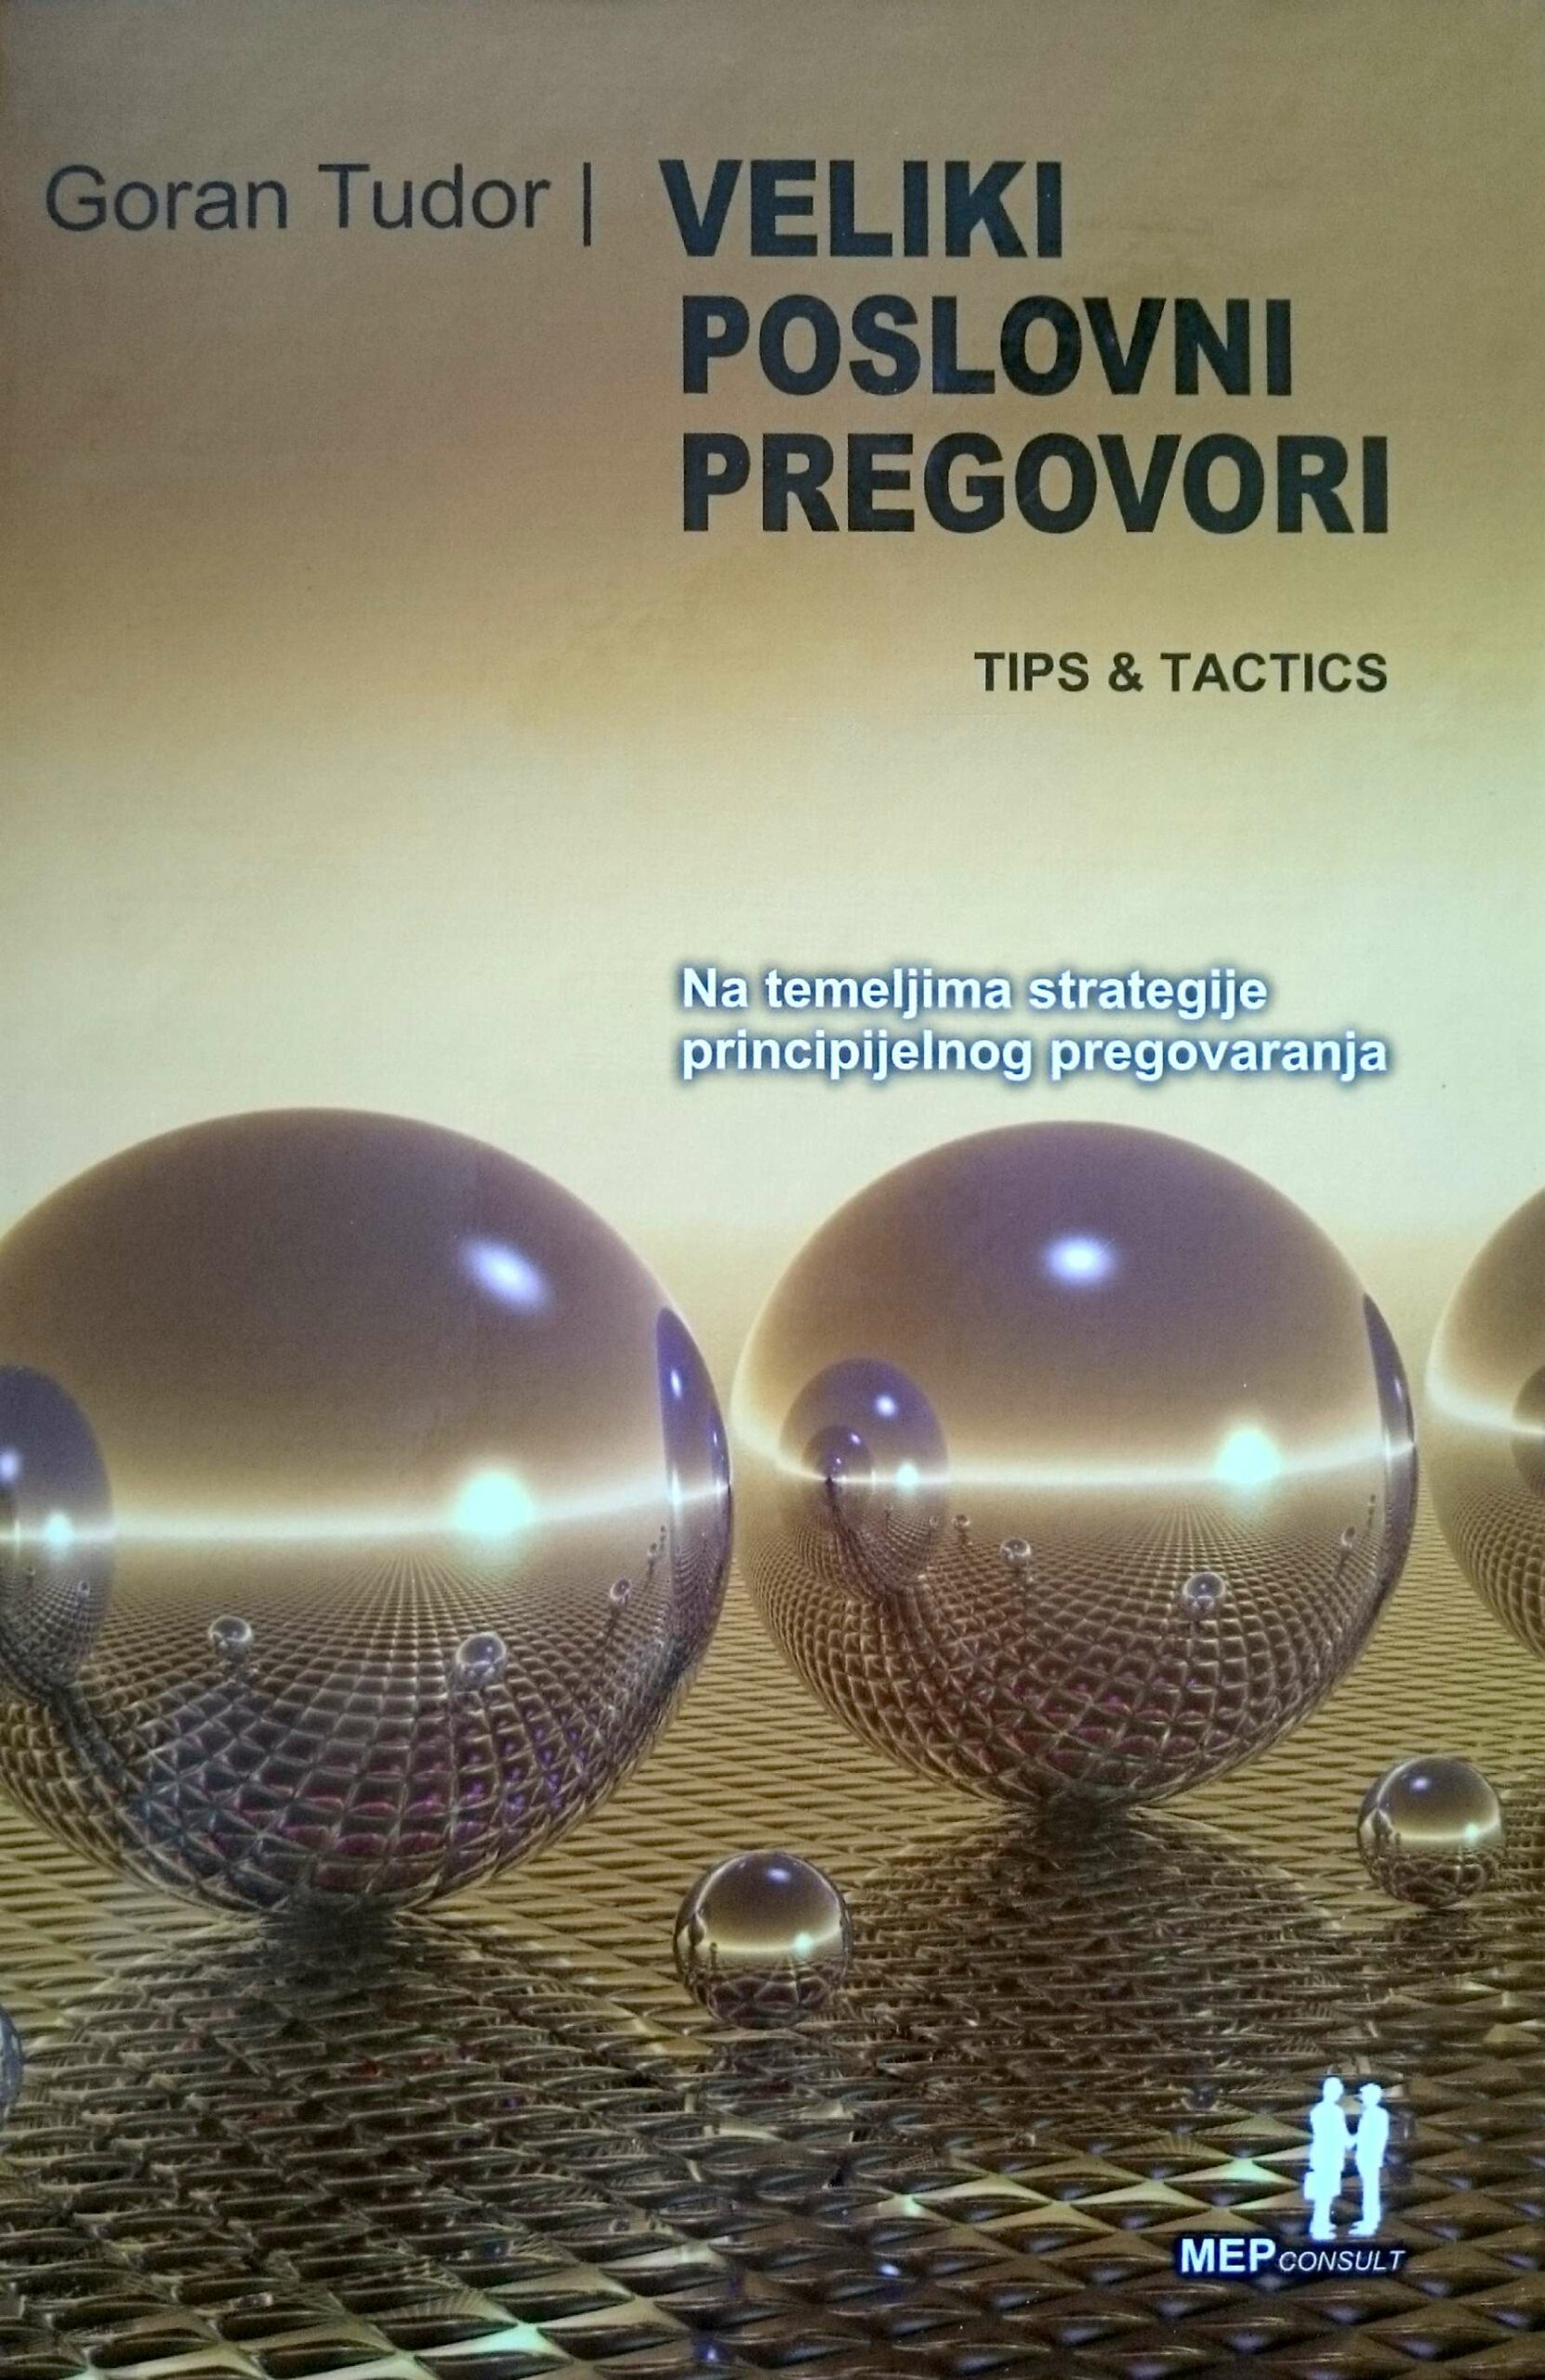 VELIKI POSLOVNI PREGOVORI, TIPS & TACTICS - Naruči svoju knjigu